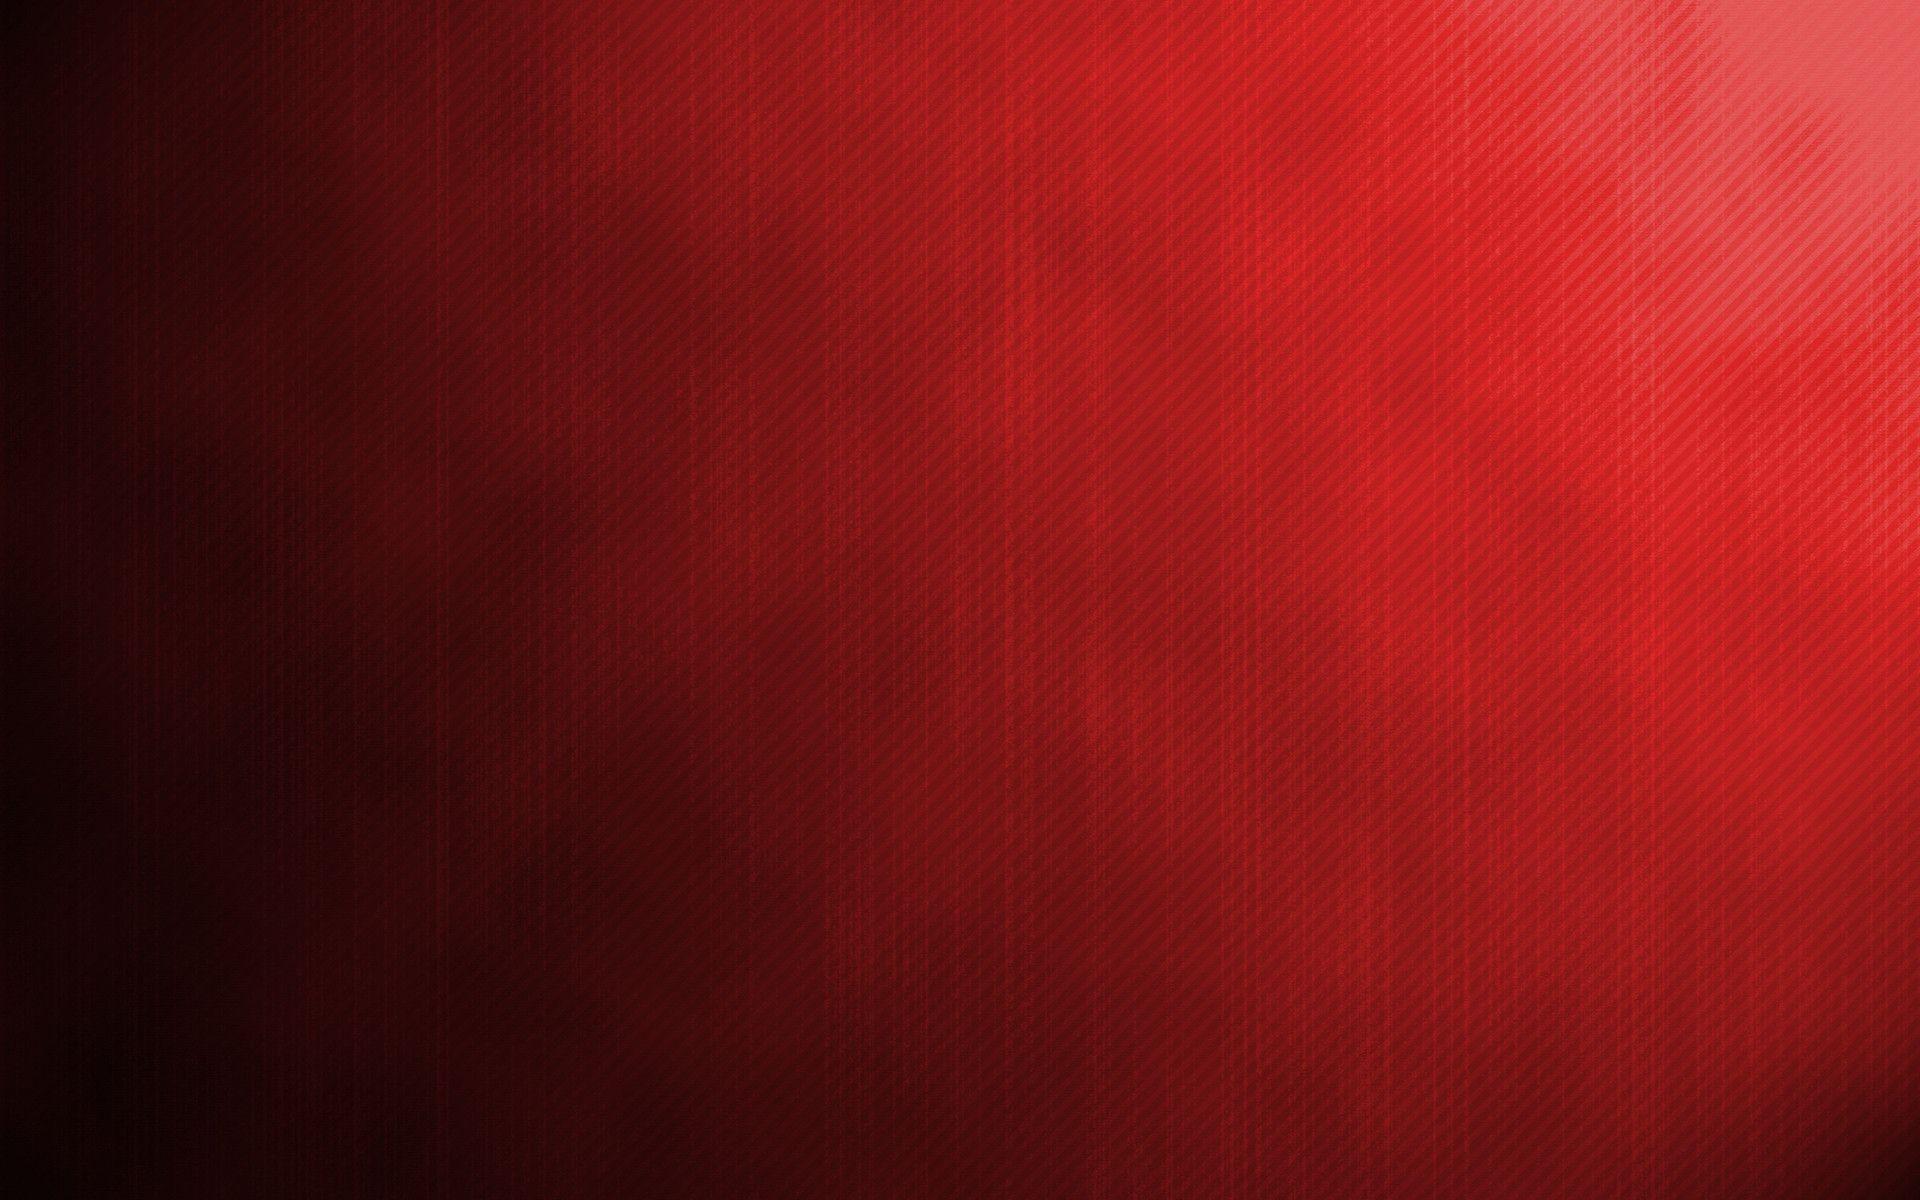 black and red background  u00b7 u2460 download free cool full hd